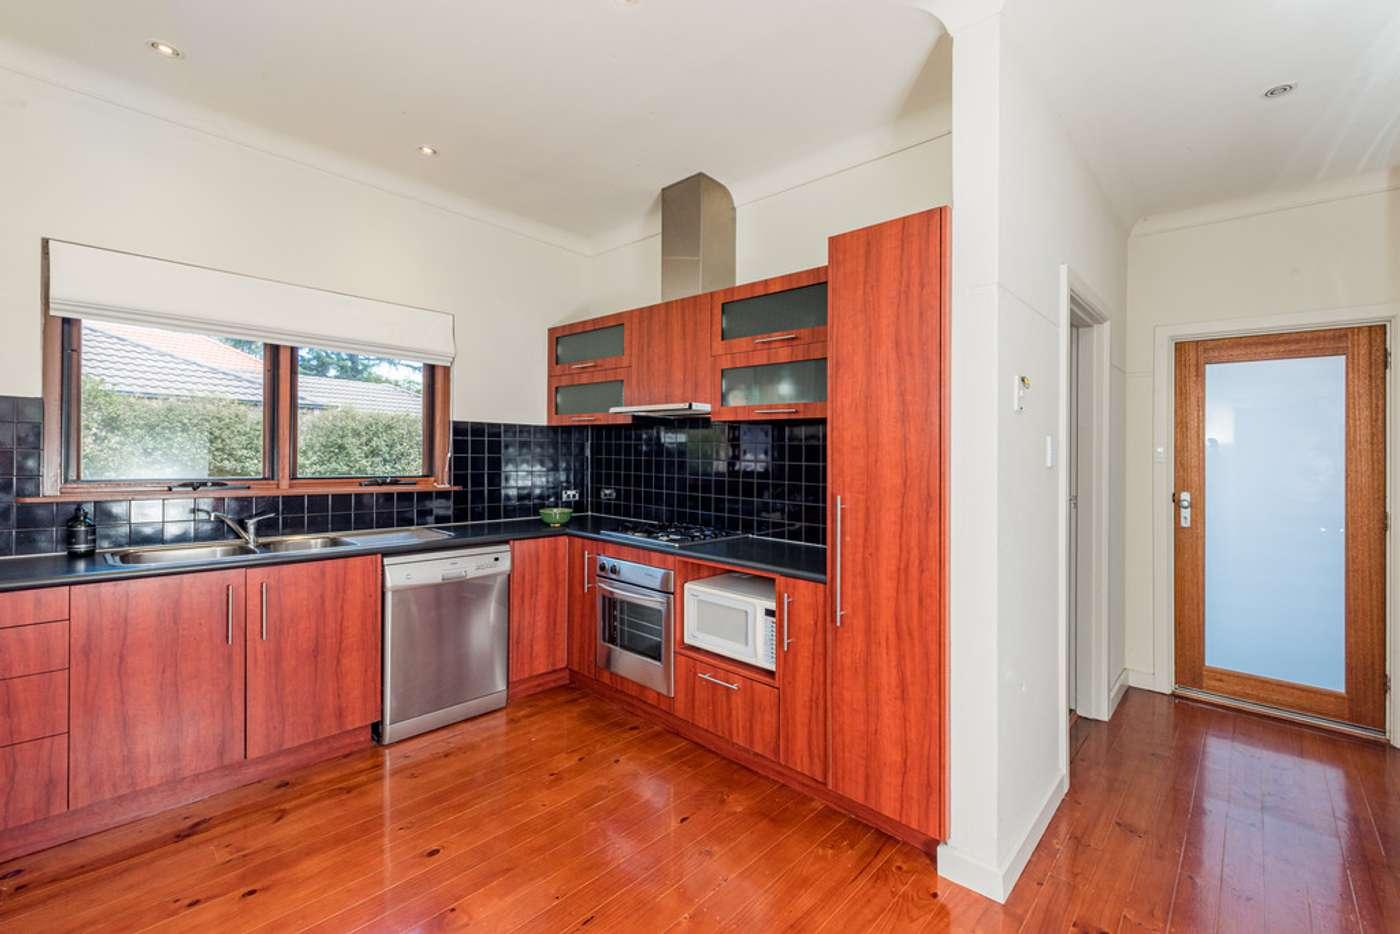 Sixth view of Homely house listing, 30 McMillan Crescent, Narrabundah ACT 2604